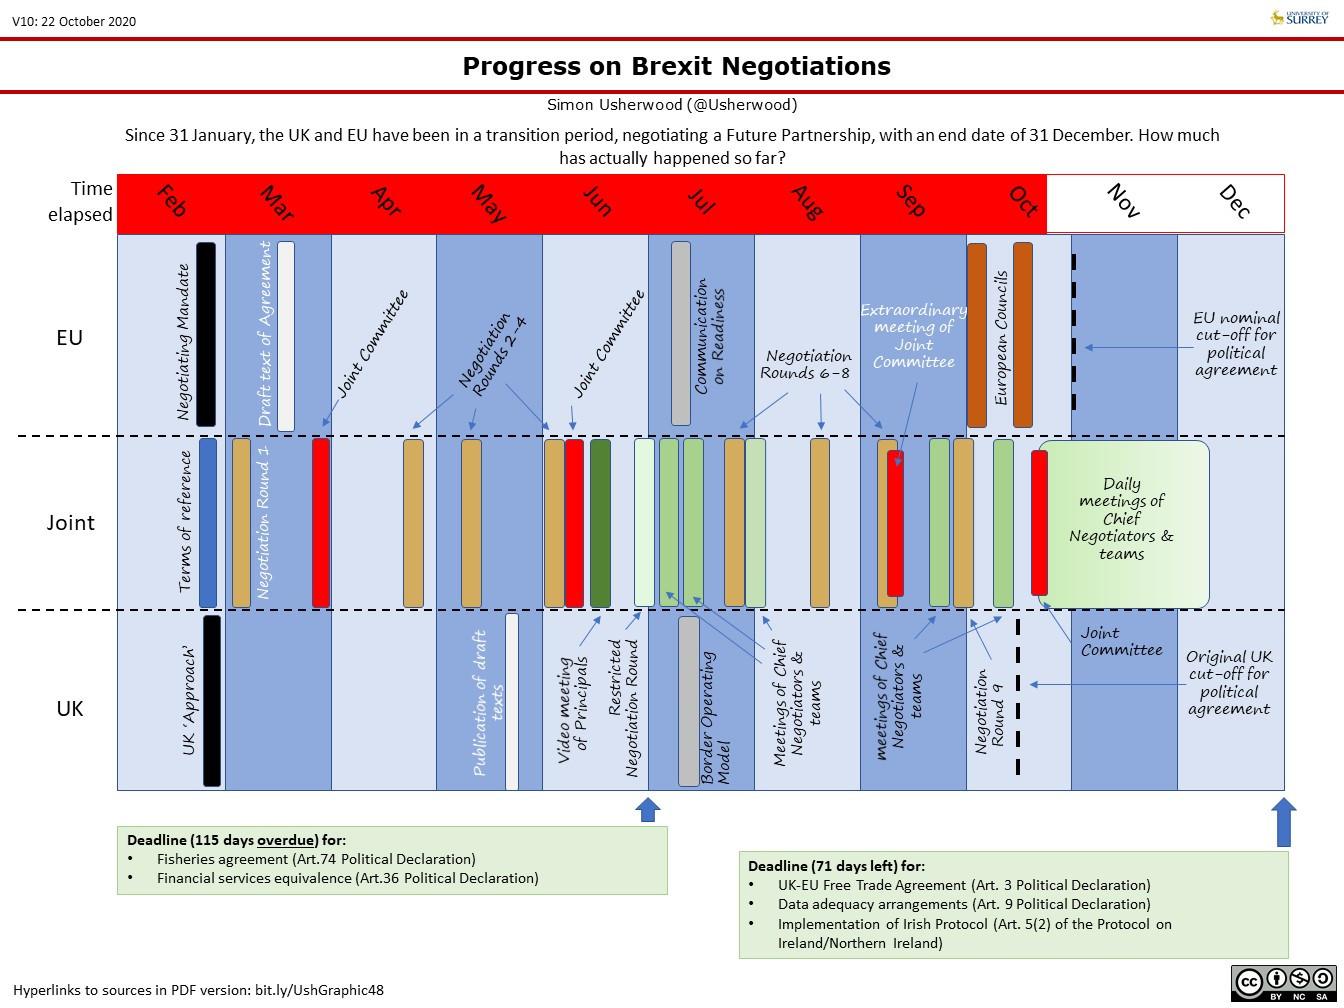 2020 Timeline Update 22 Oct 20.jpg